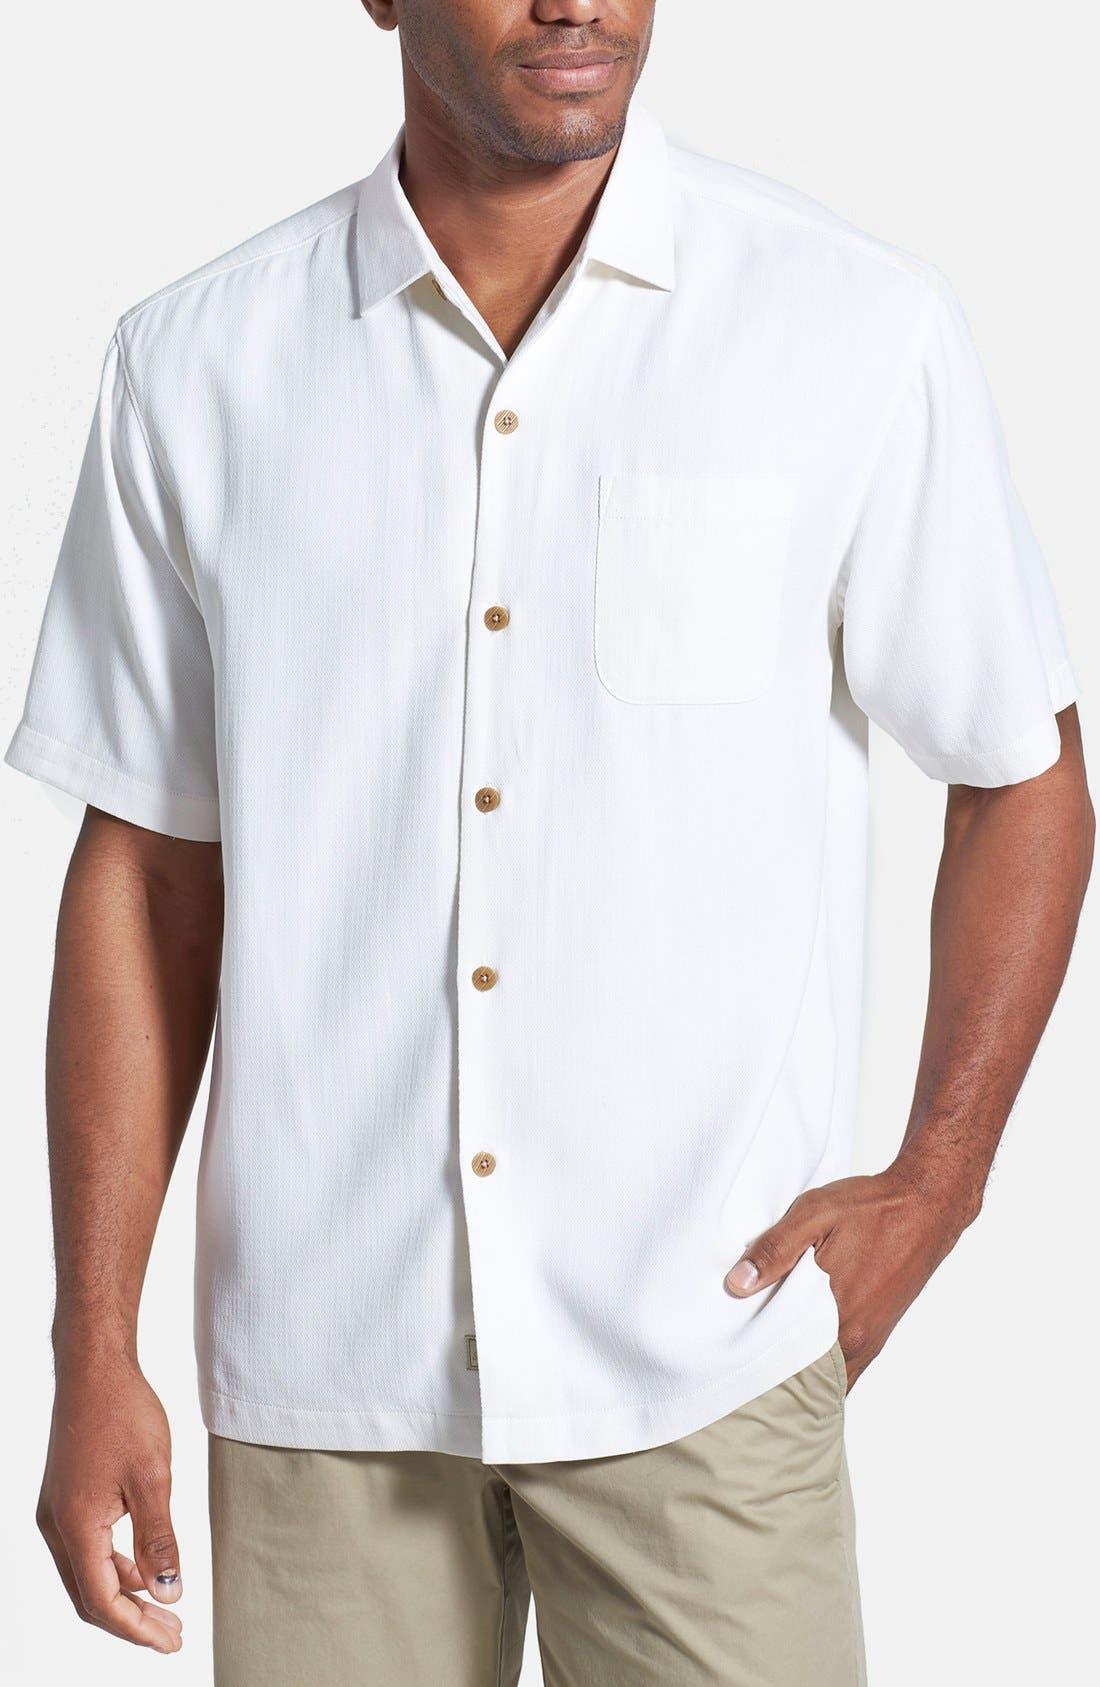 Main Image - Tommy Bahama 'Isla Diamond' Original Fit Silk Camp Shirt